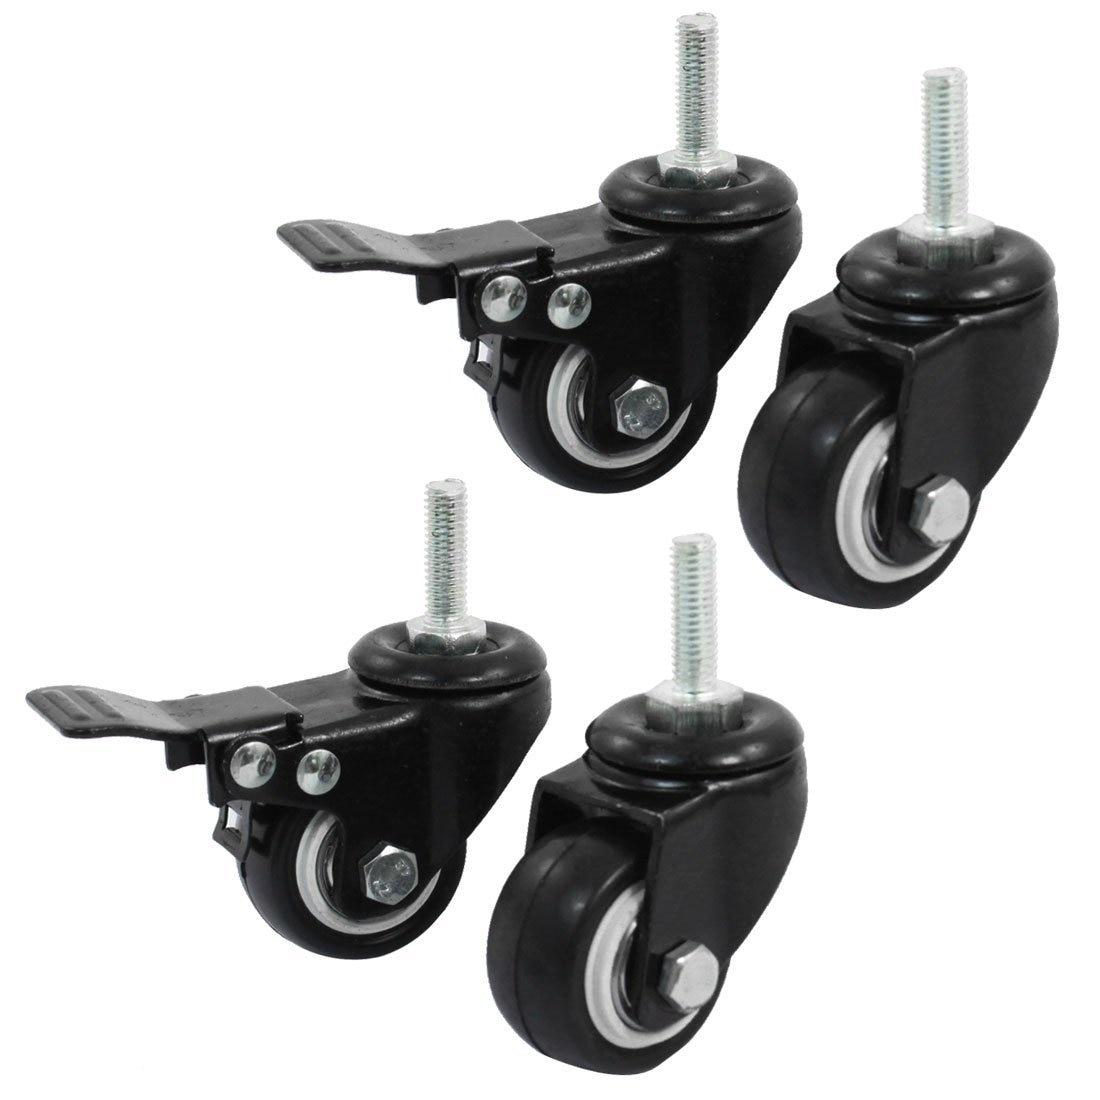 M8 Metal 360 giratorio 4 unids/lote 1,5 pulgadas carrito de la compra freno giratorio rueda giratoria doble bola rodamientos negro poliuretano